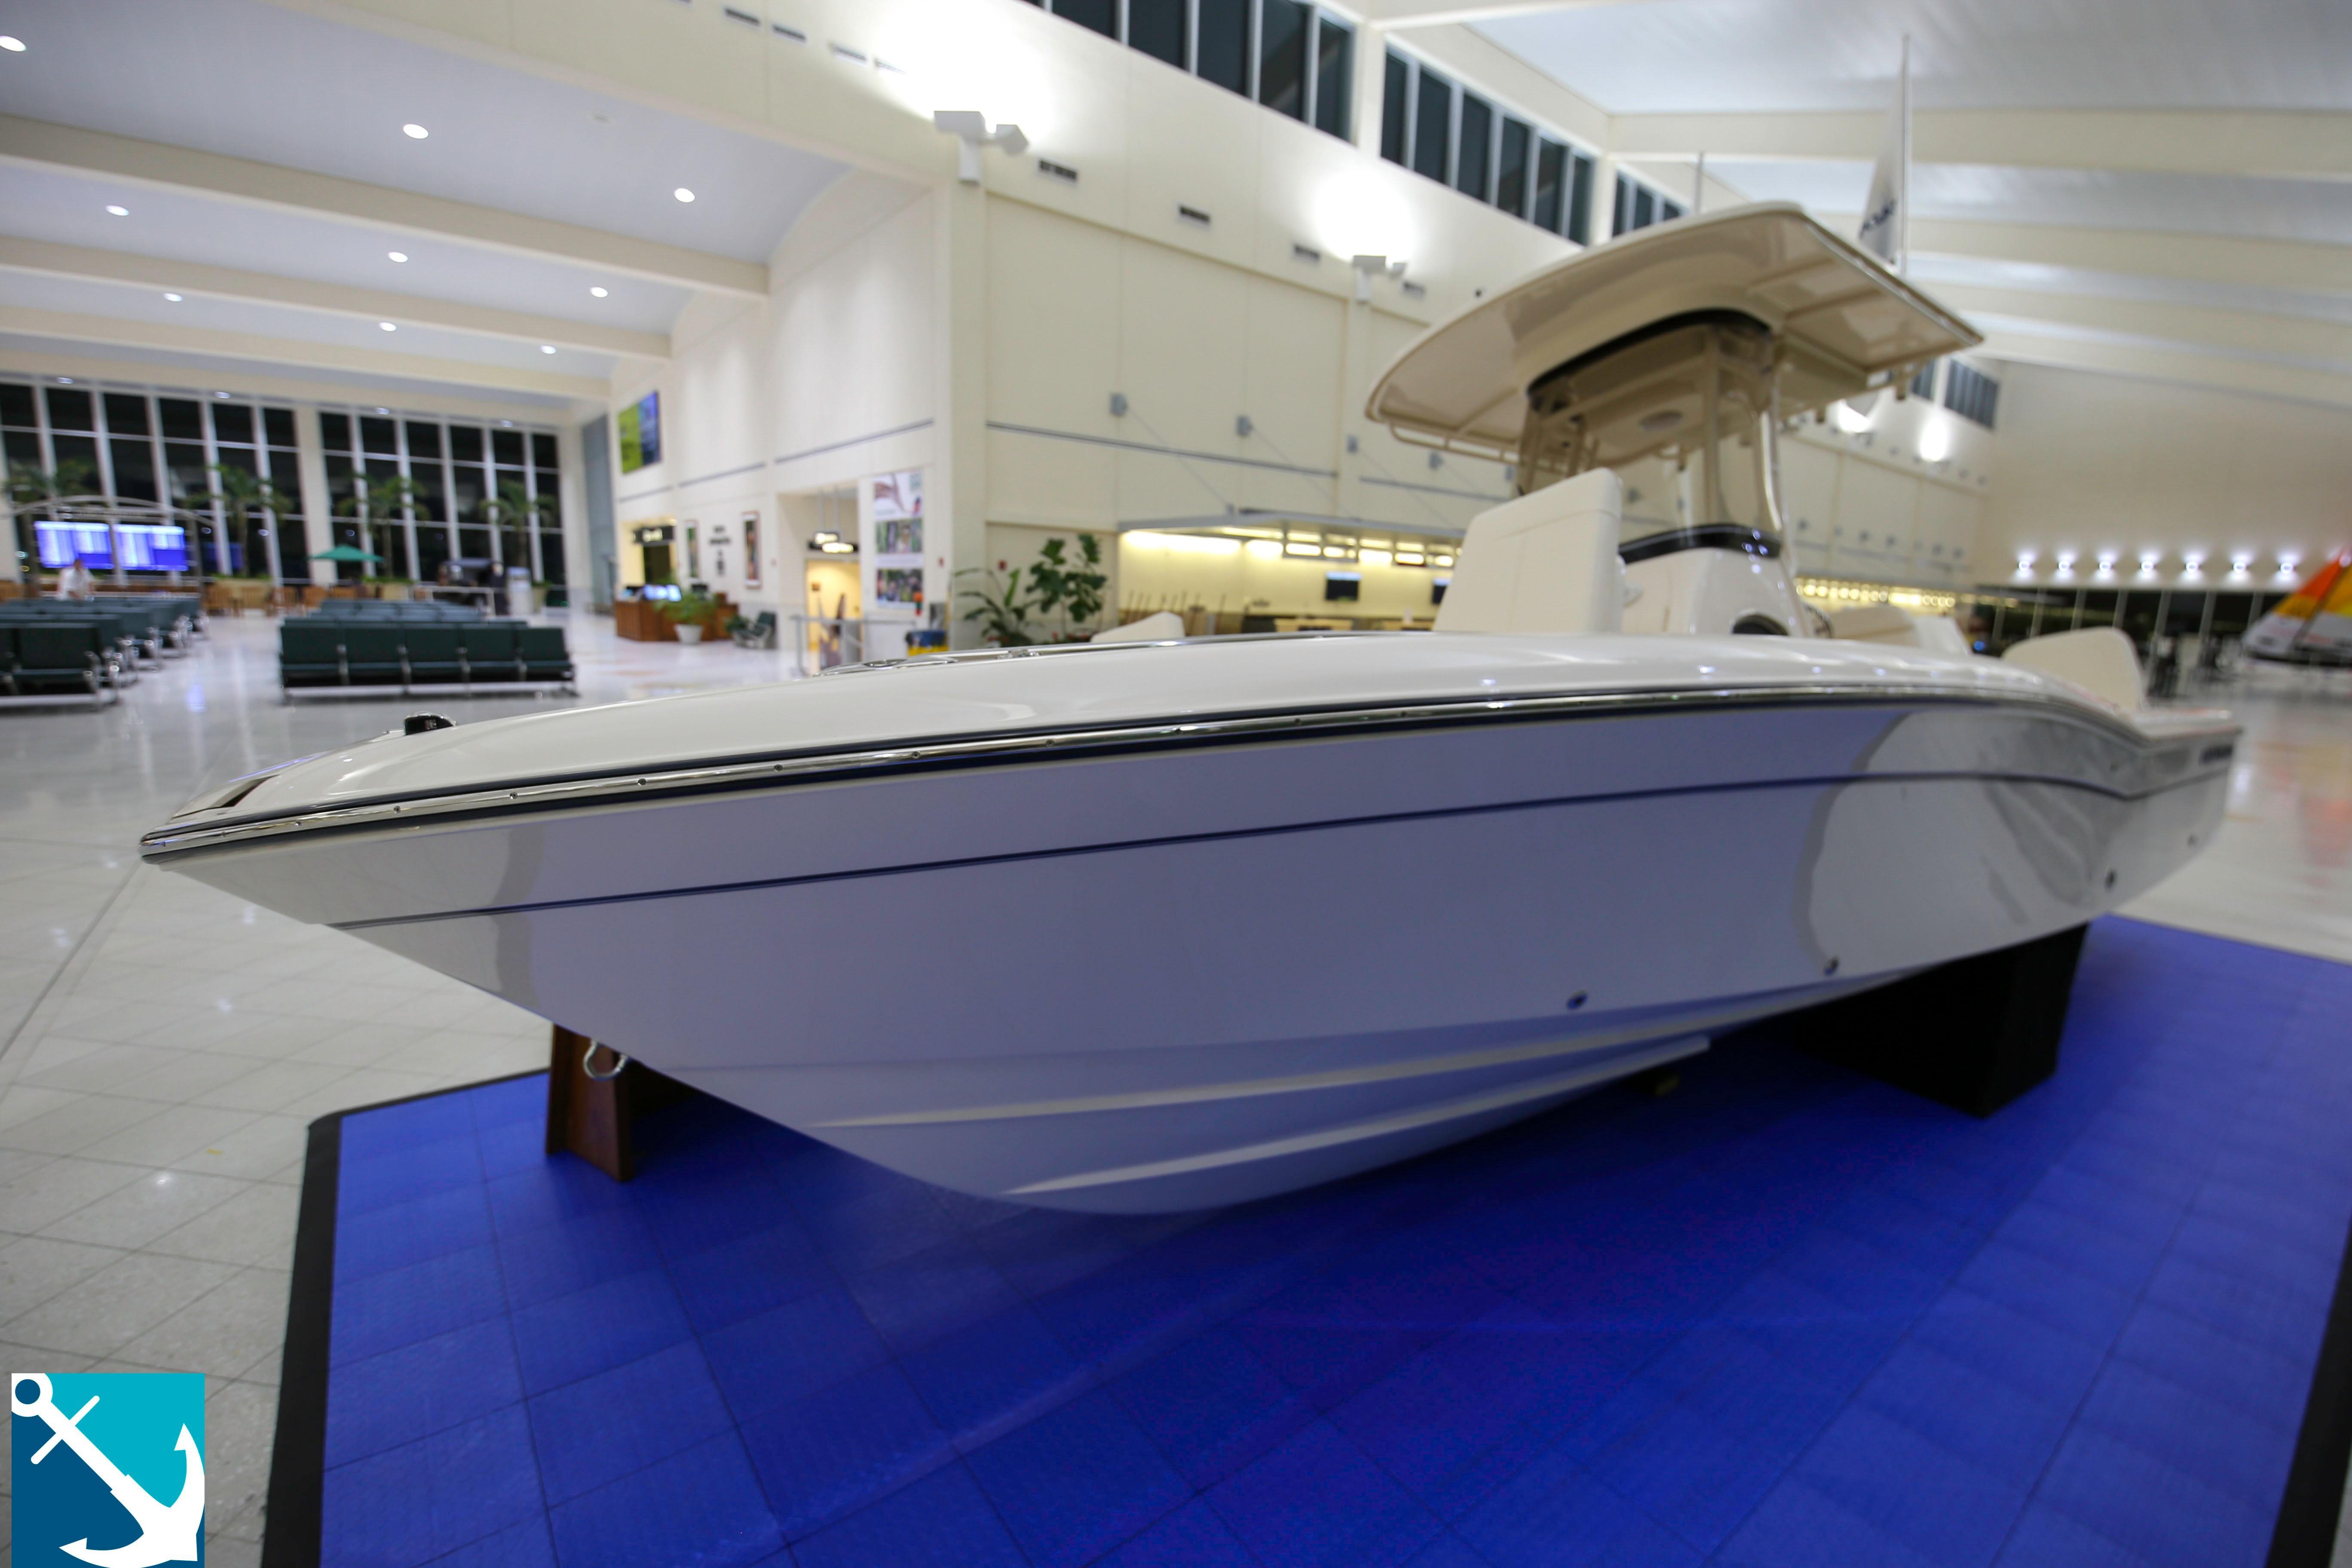 Grady-White 251 Coastal Explorer 2020 4